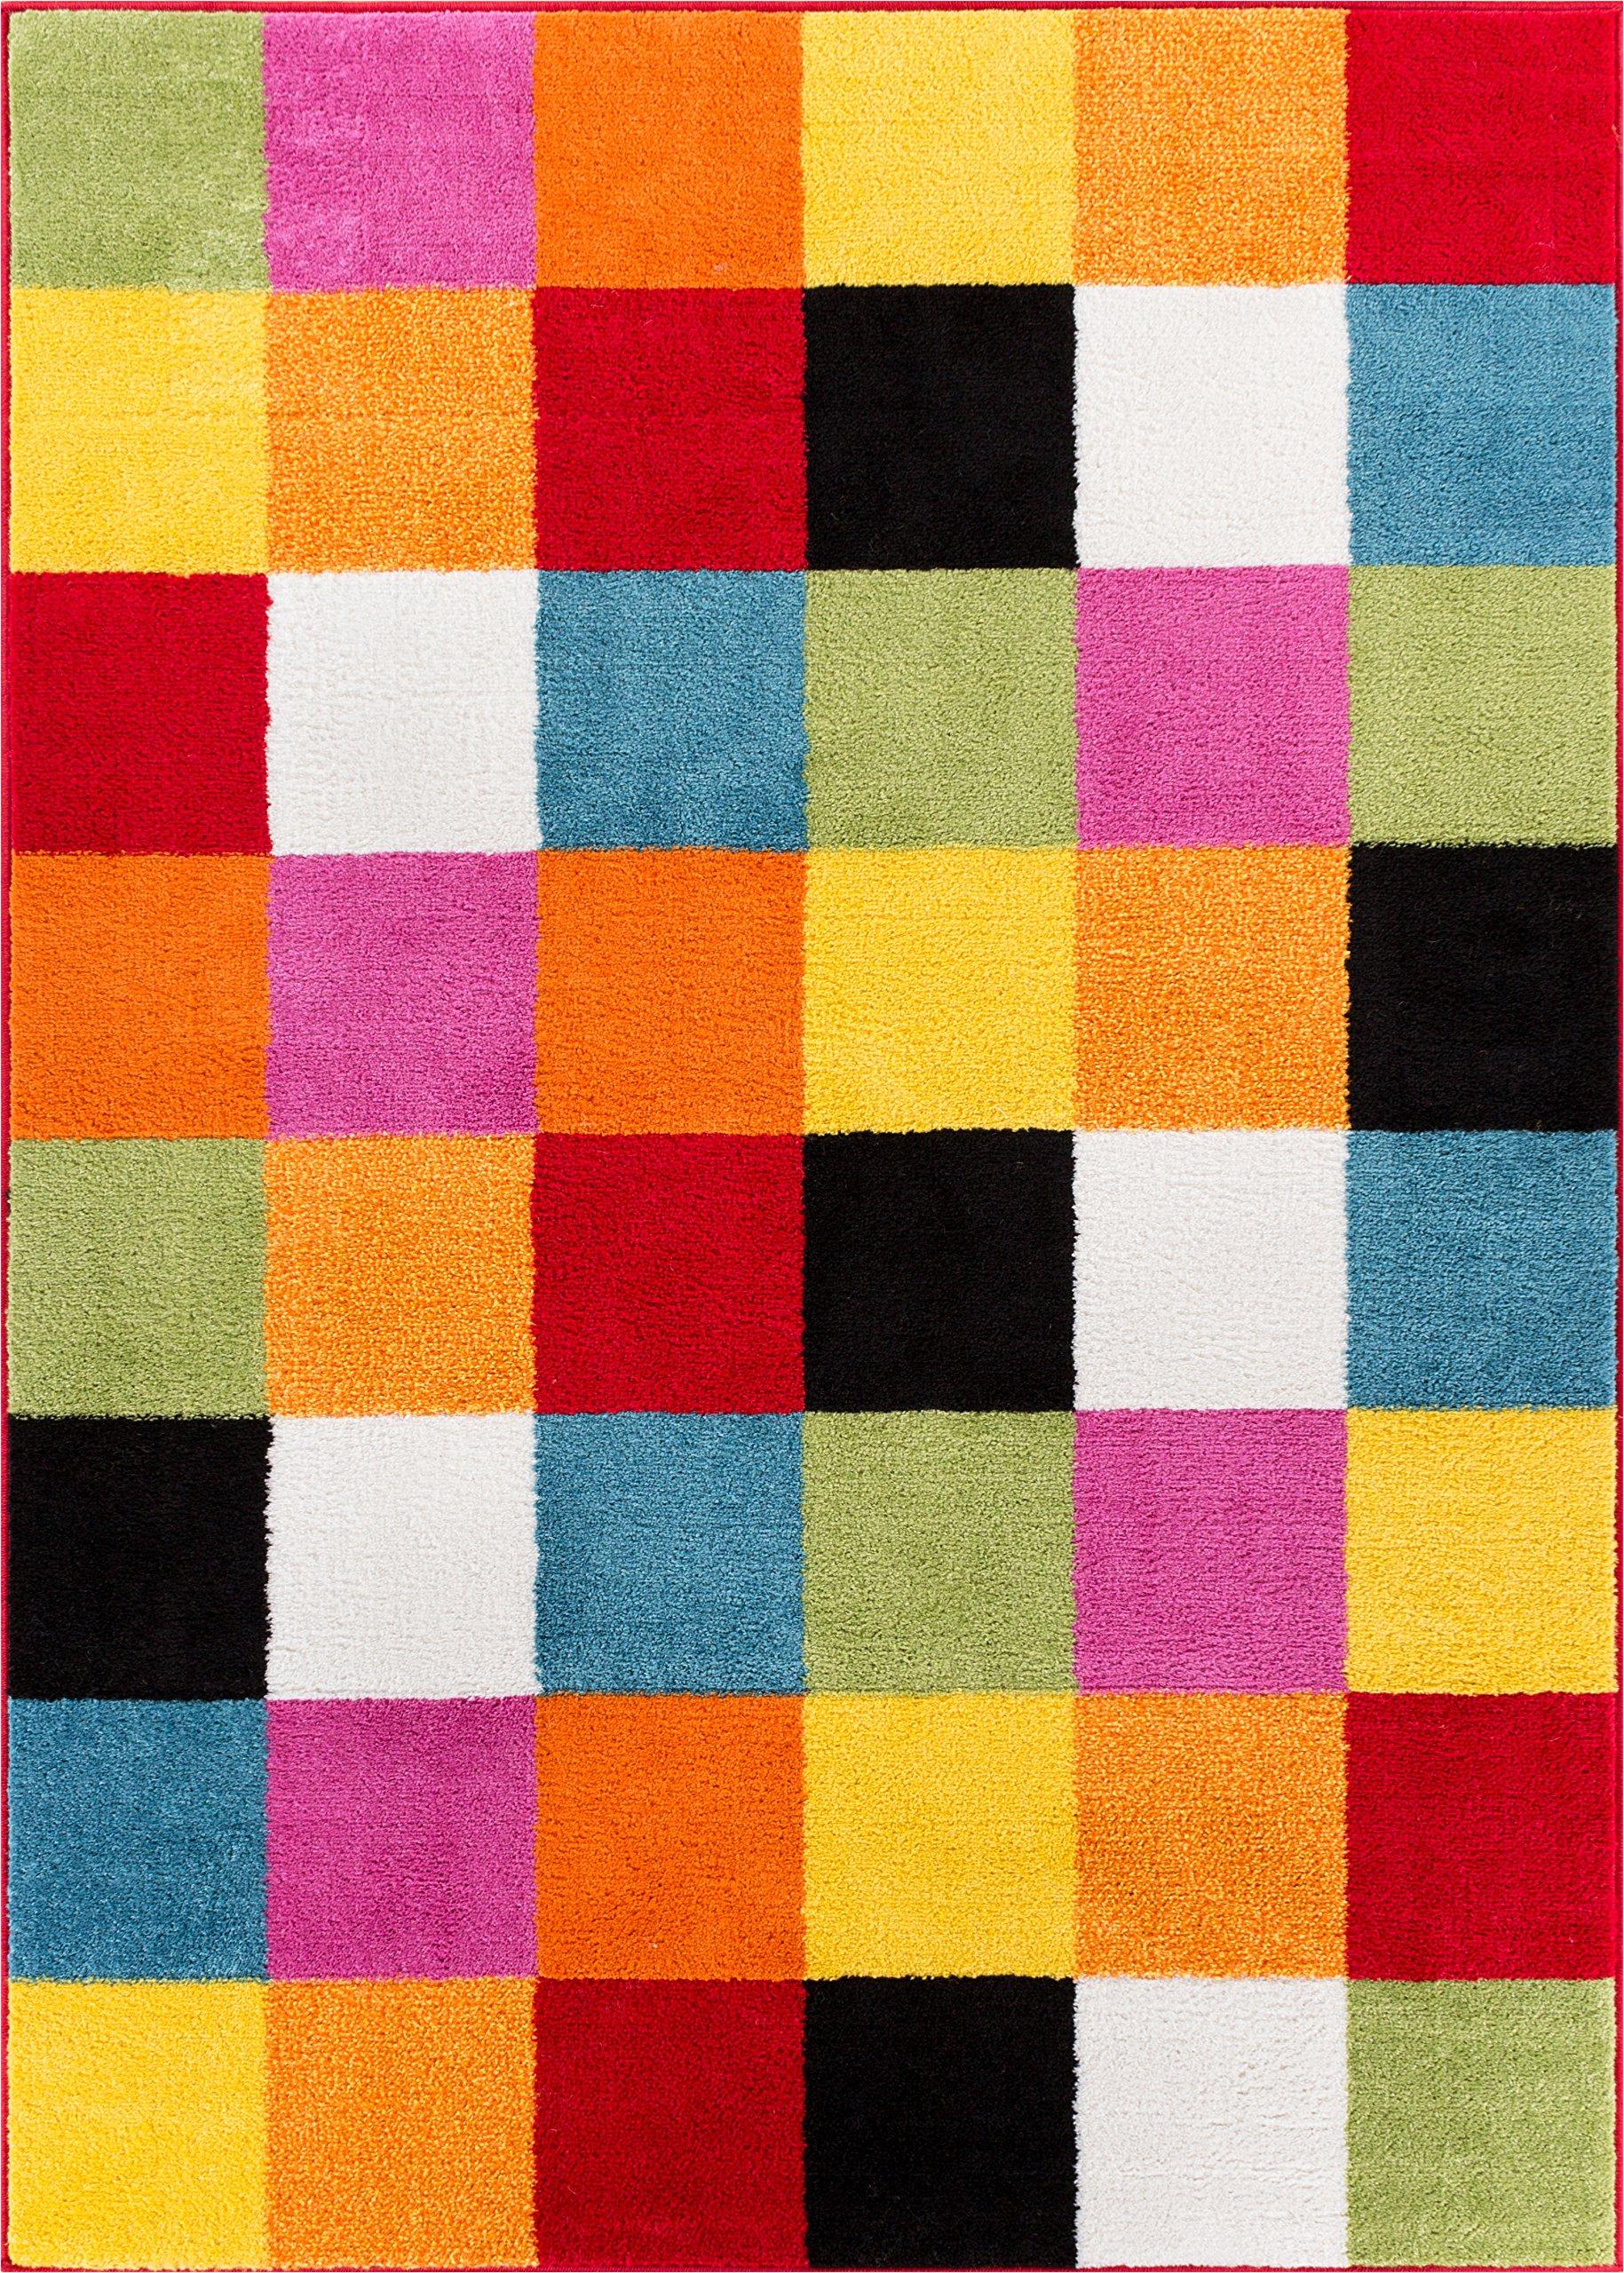 Well Woven 09534 Kids Rug Starbright Bright Square Modern Geometric x 5 Area, 3'3'' x 5', Multi